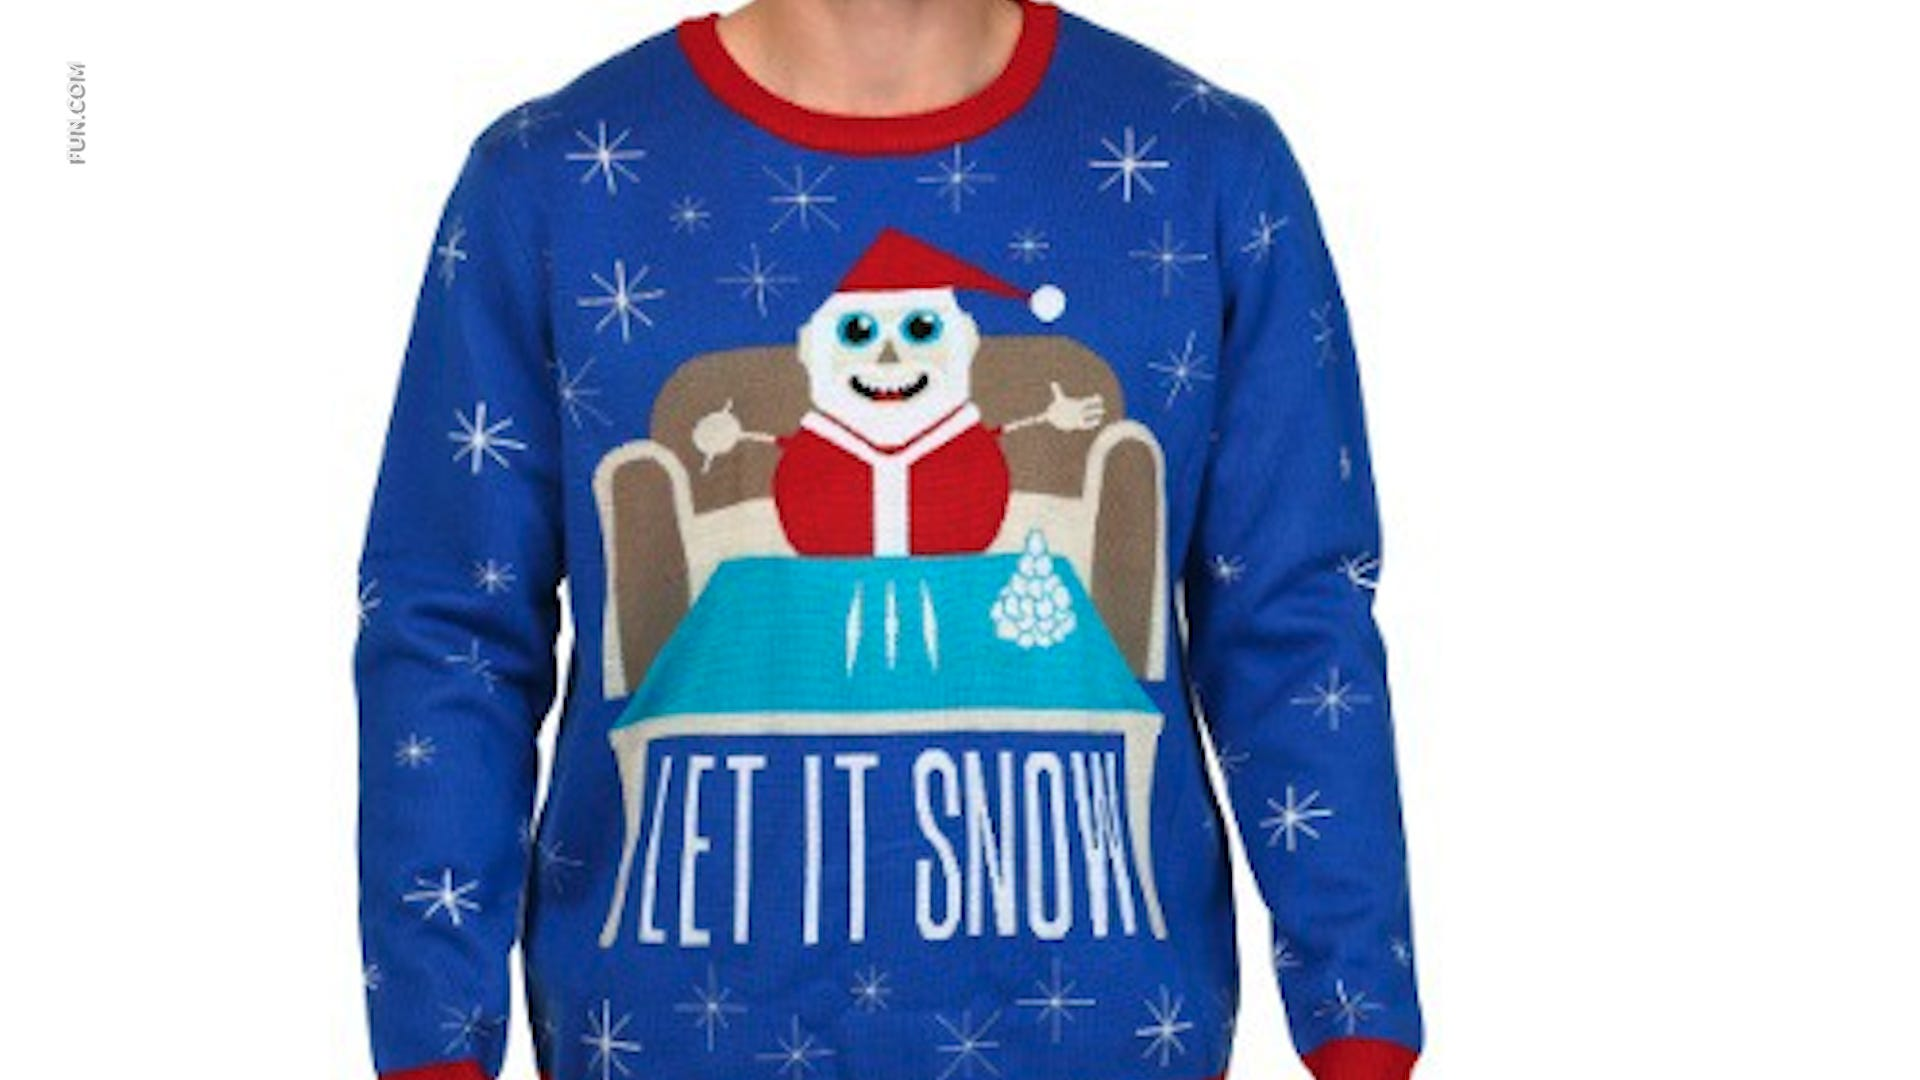 Walmart apologizes for Christmas \u0027cocaine\u0027 sweater